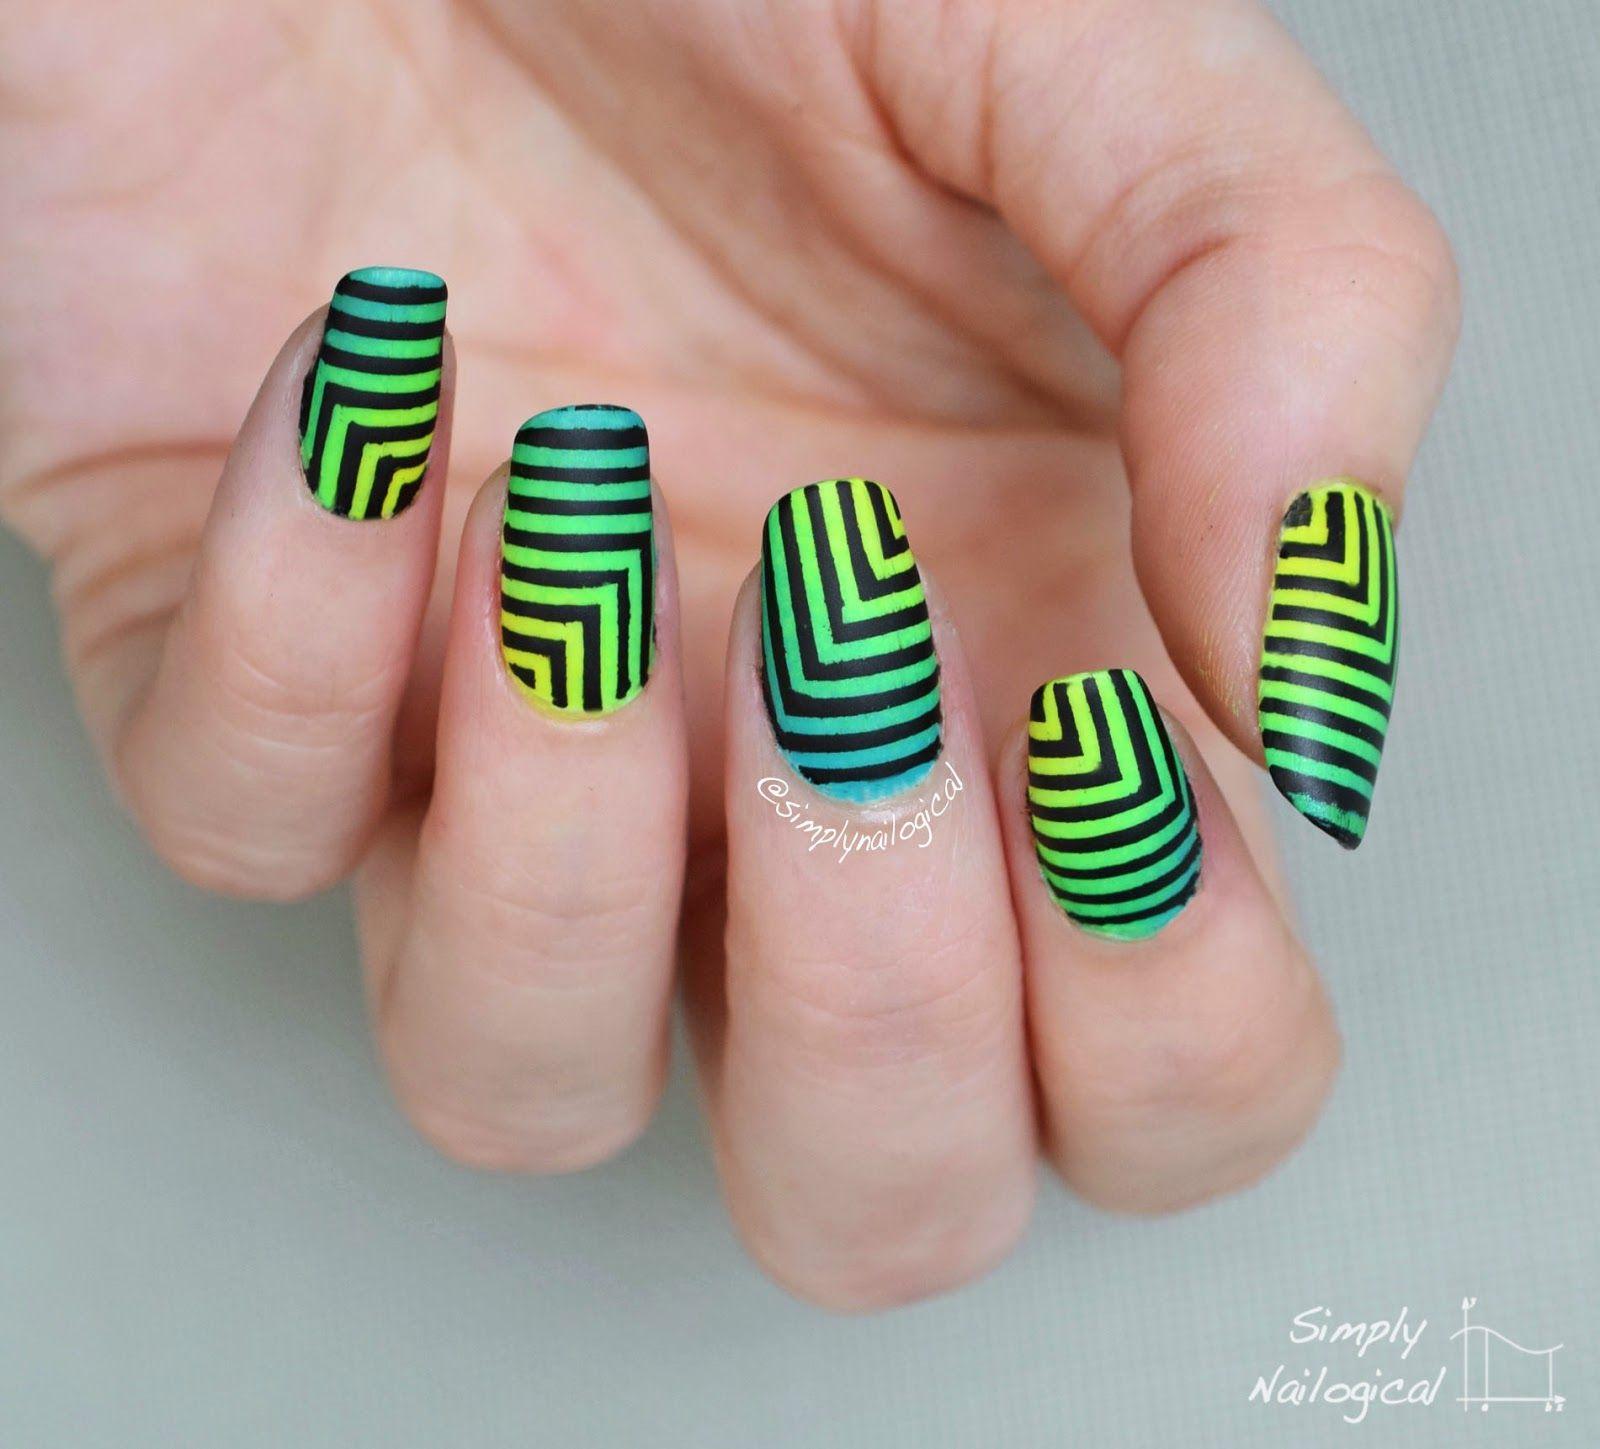 Simply Nailogical Nail Art: Simply Nailogical: Hypnotizing Black Neon Squares